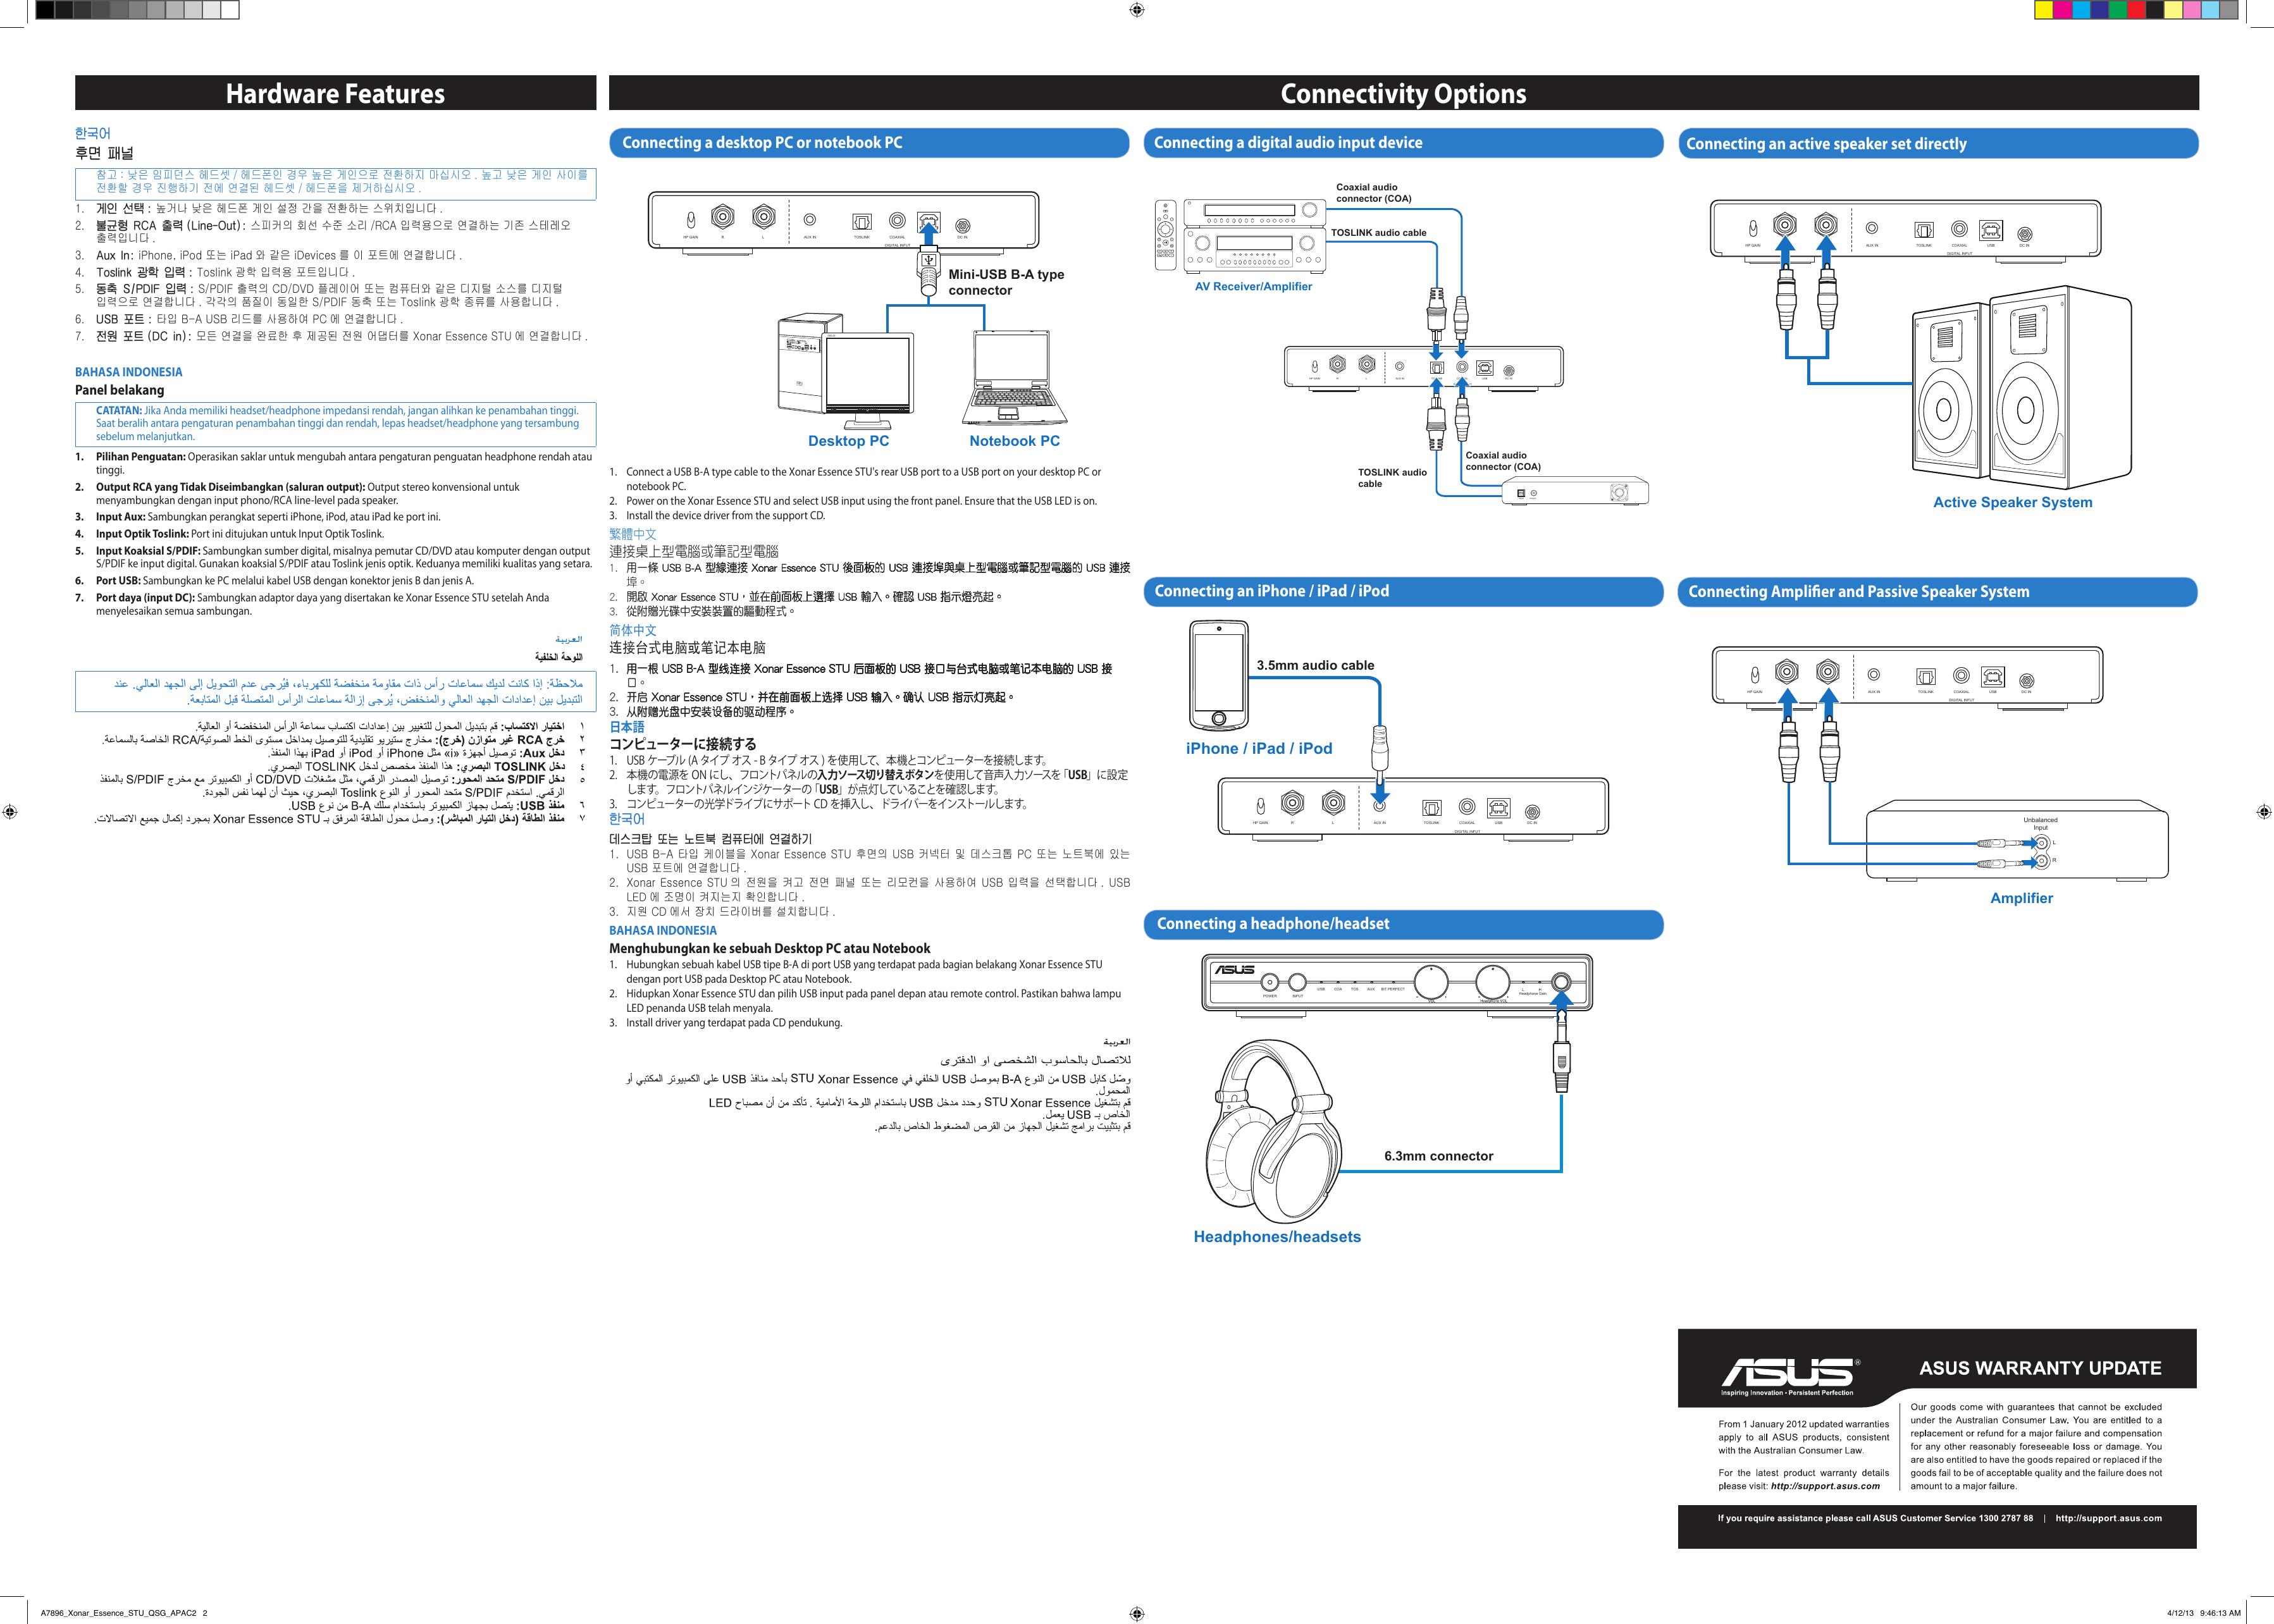 Asus Xonar Essence Stu A7896 Users Manual Usb Cable Wiring Diagram